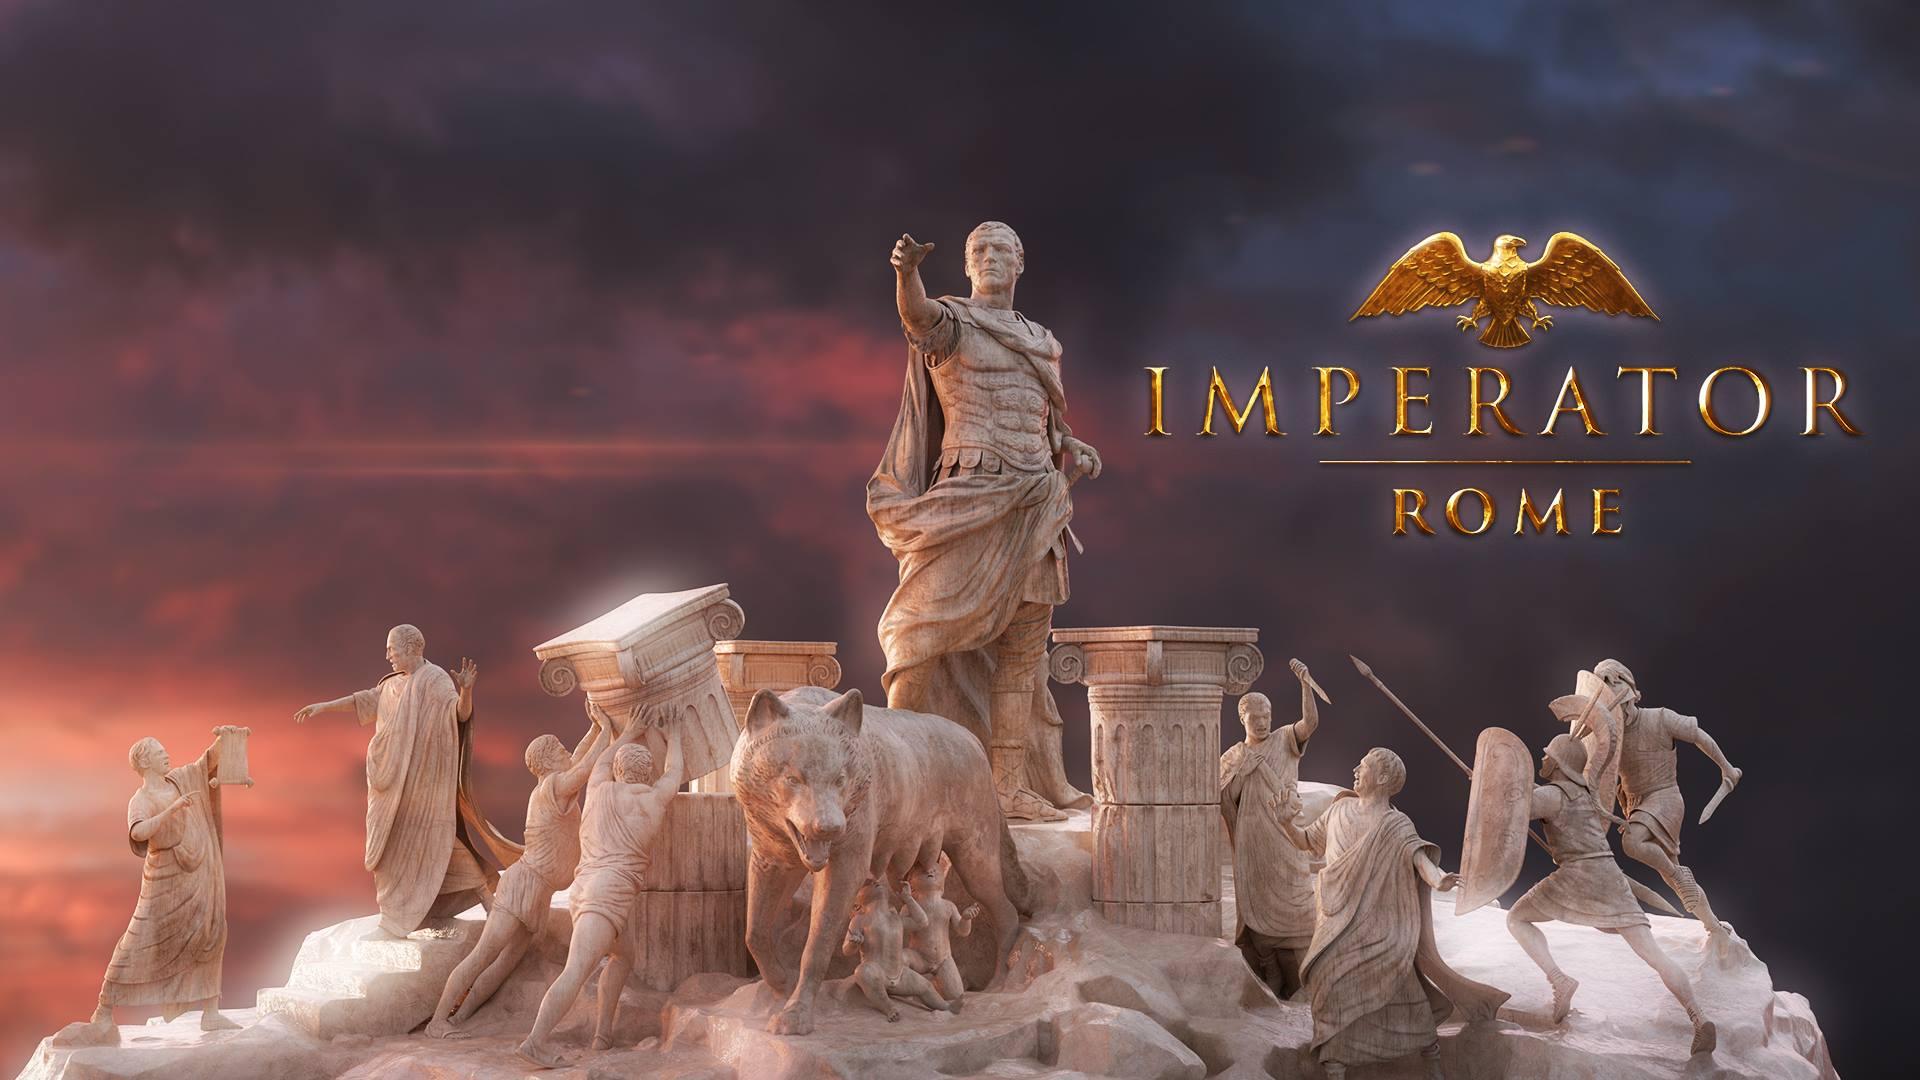 Консольные команды для Imperator: Rome